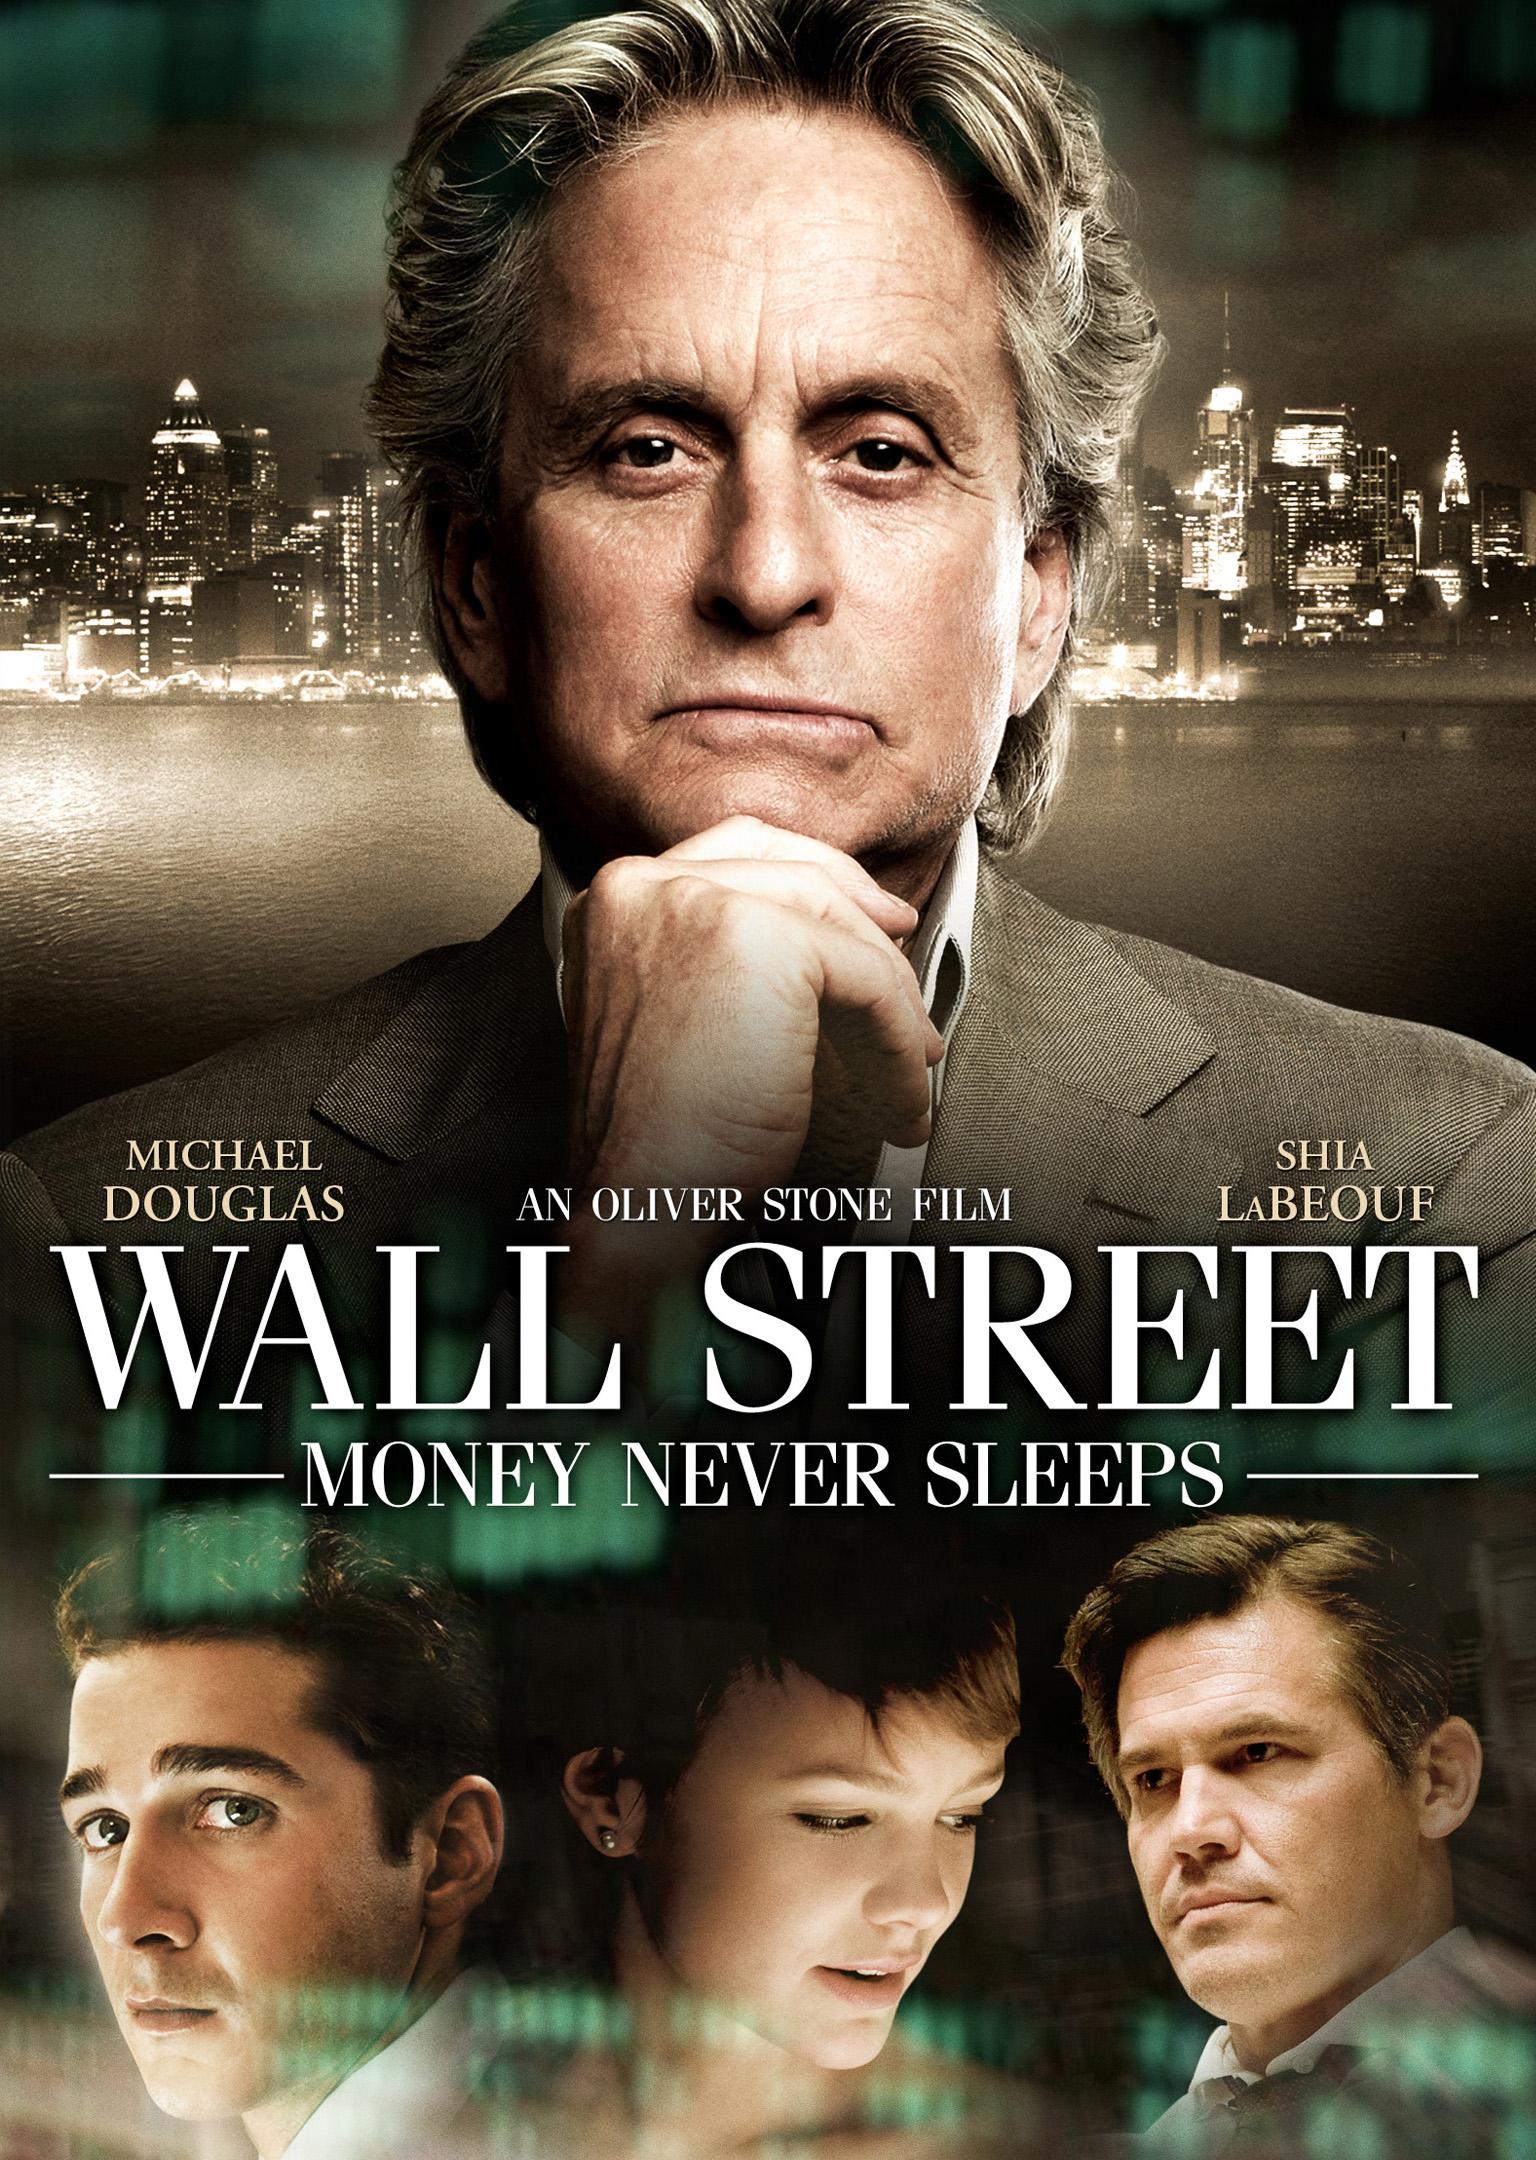 Films - To Watch List Money_never_sleeps